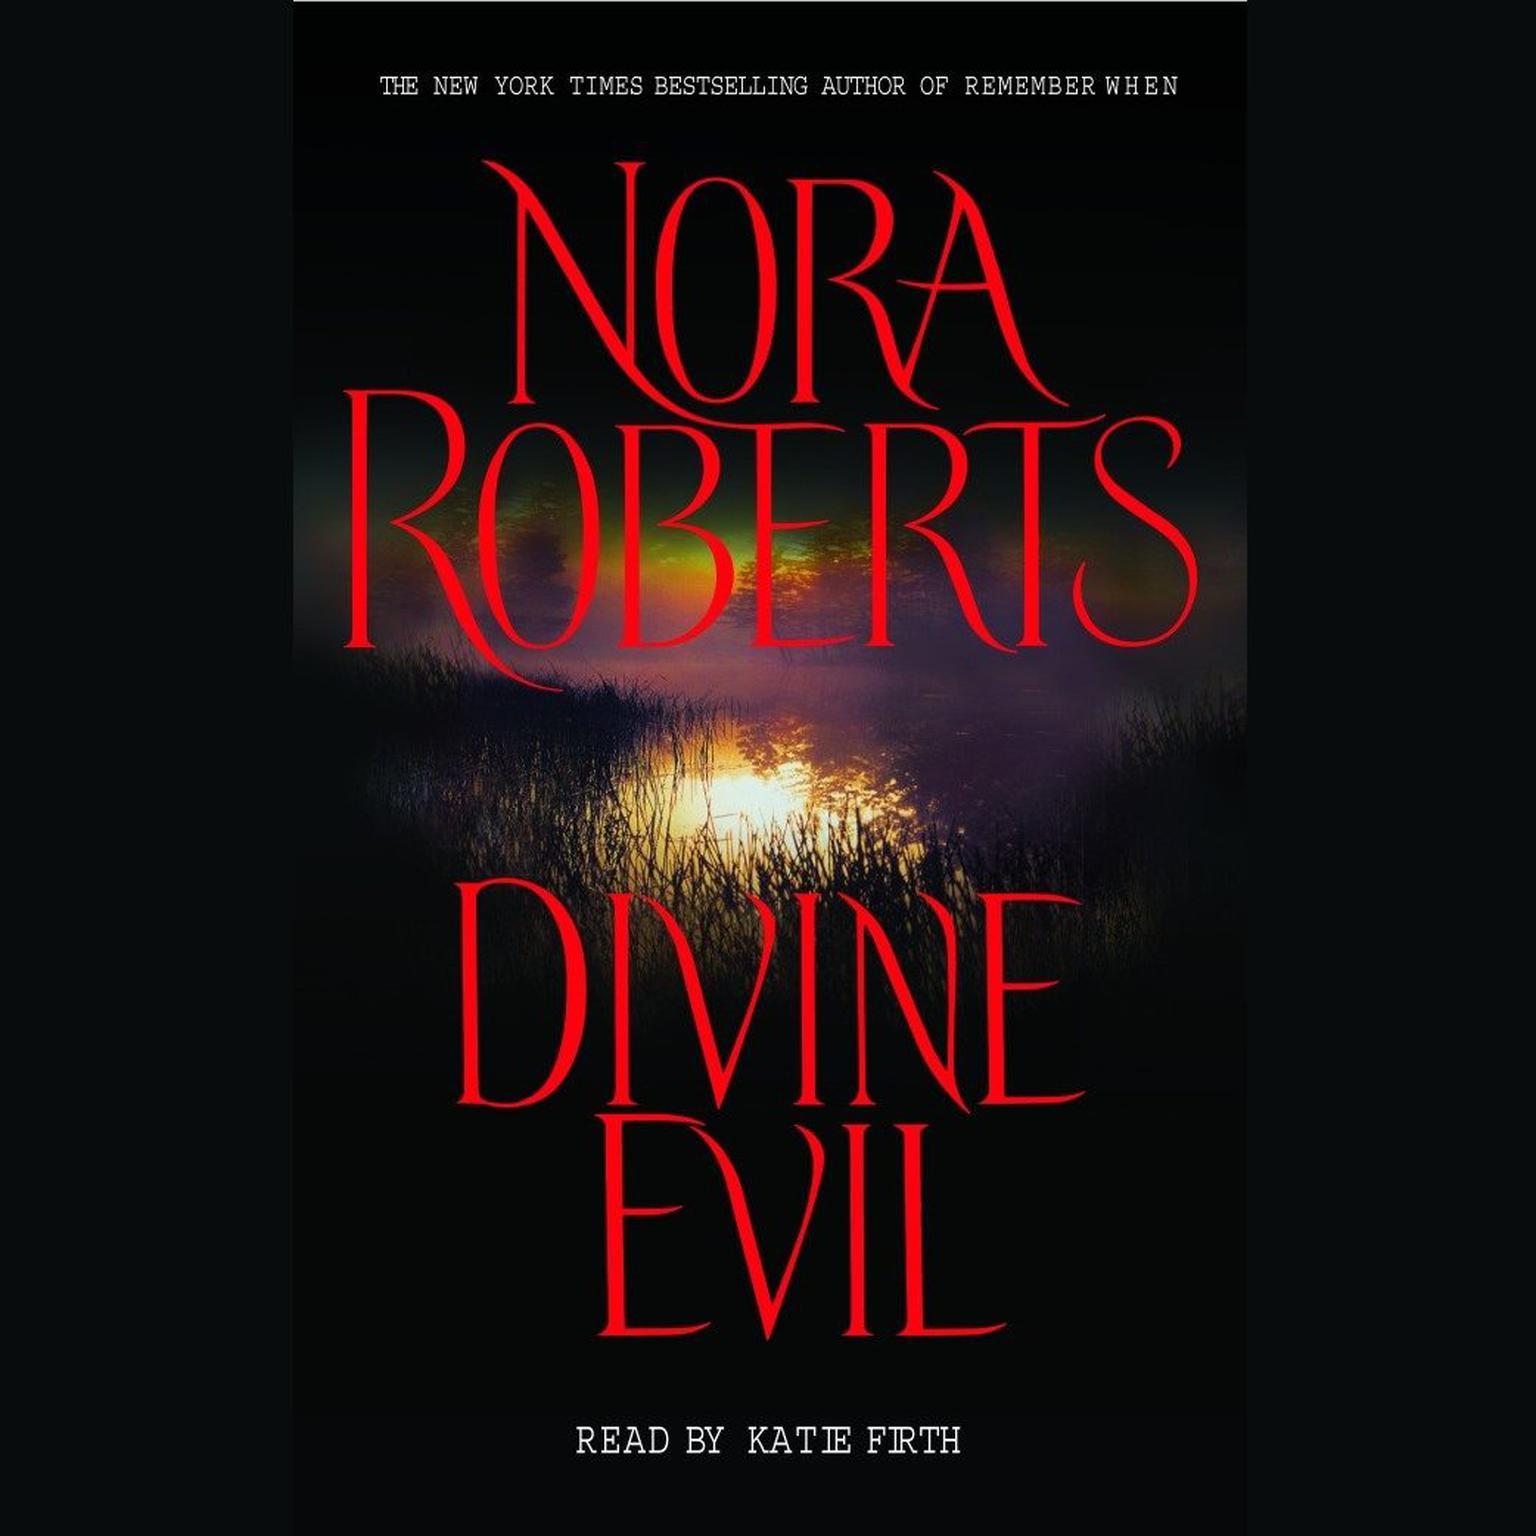 Printable Divine Evil Audiobook Cover Art